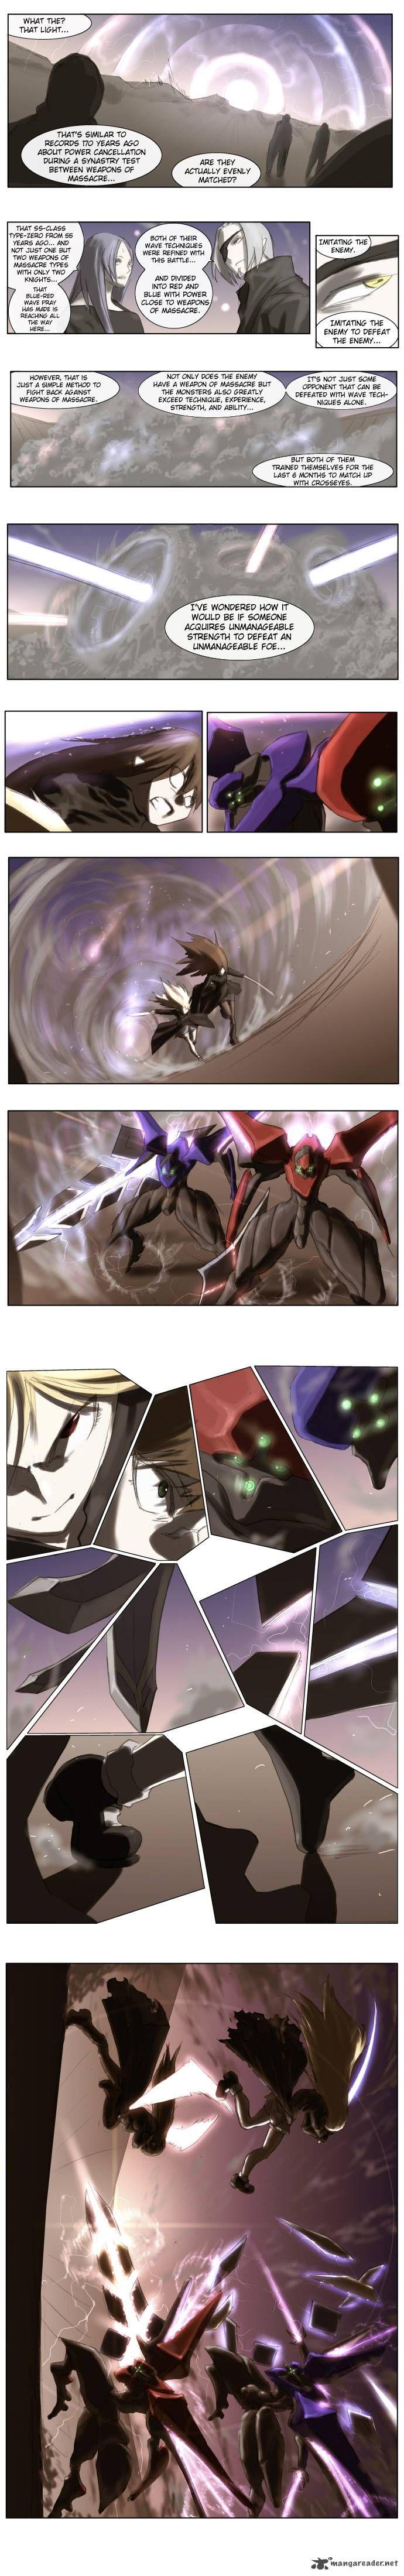 Knight Run 29 Page 3